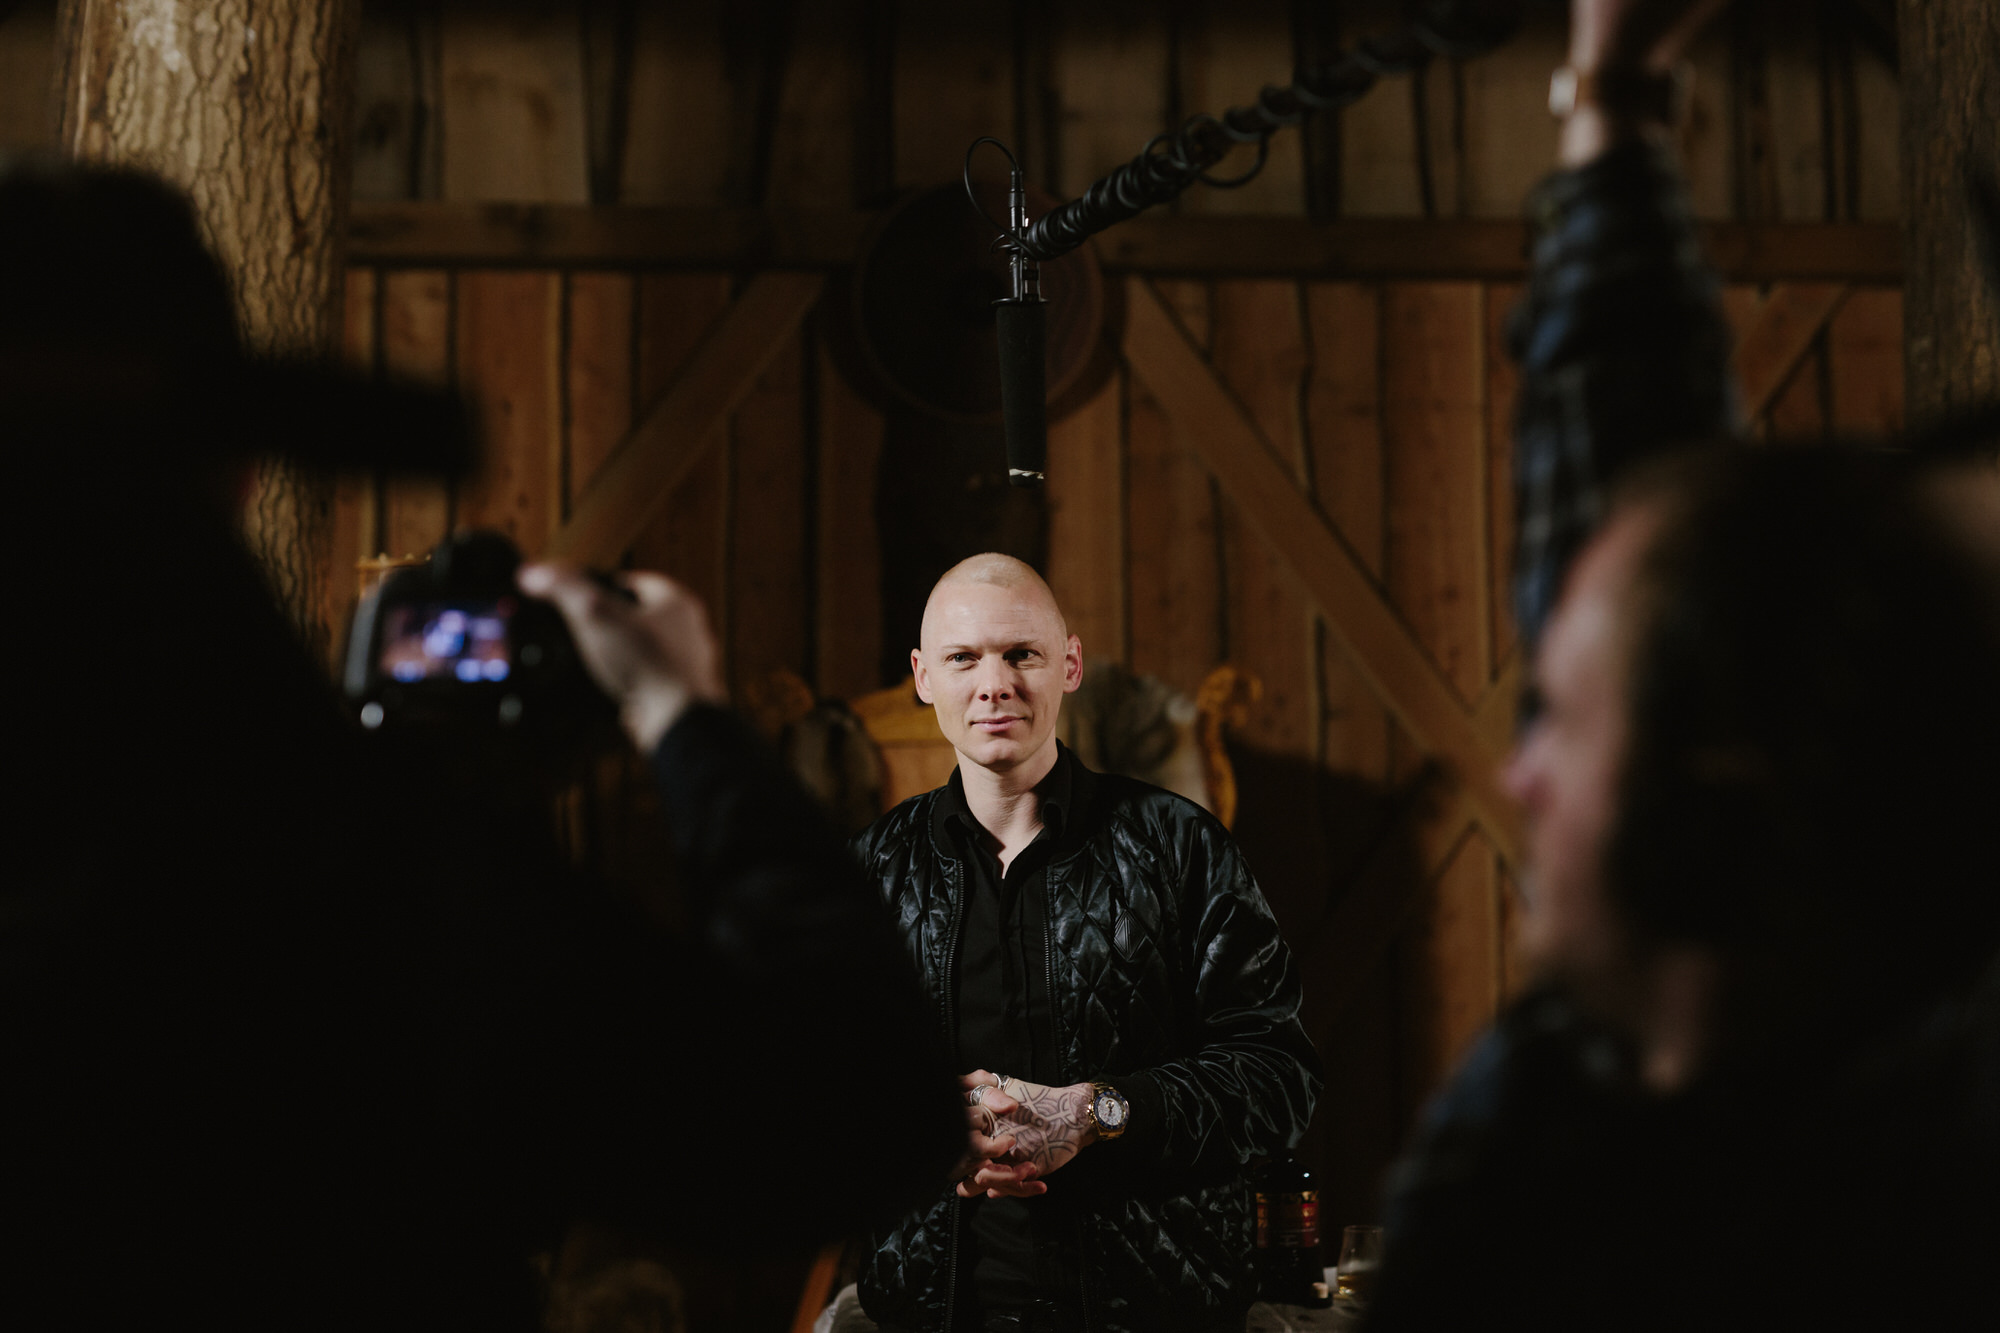 jim-lingvild-interview-highland-park-valkyrie-video-shoot.jpg